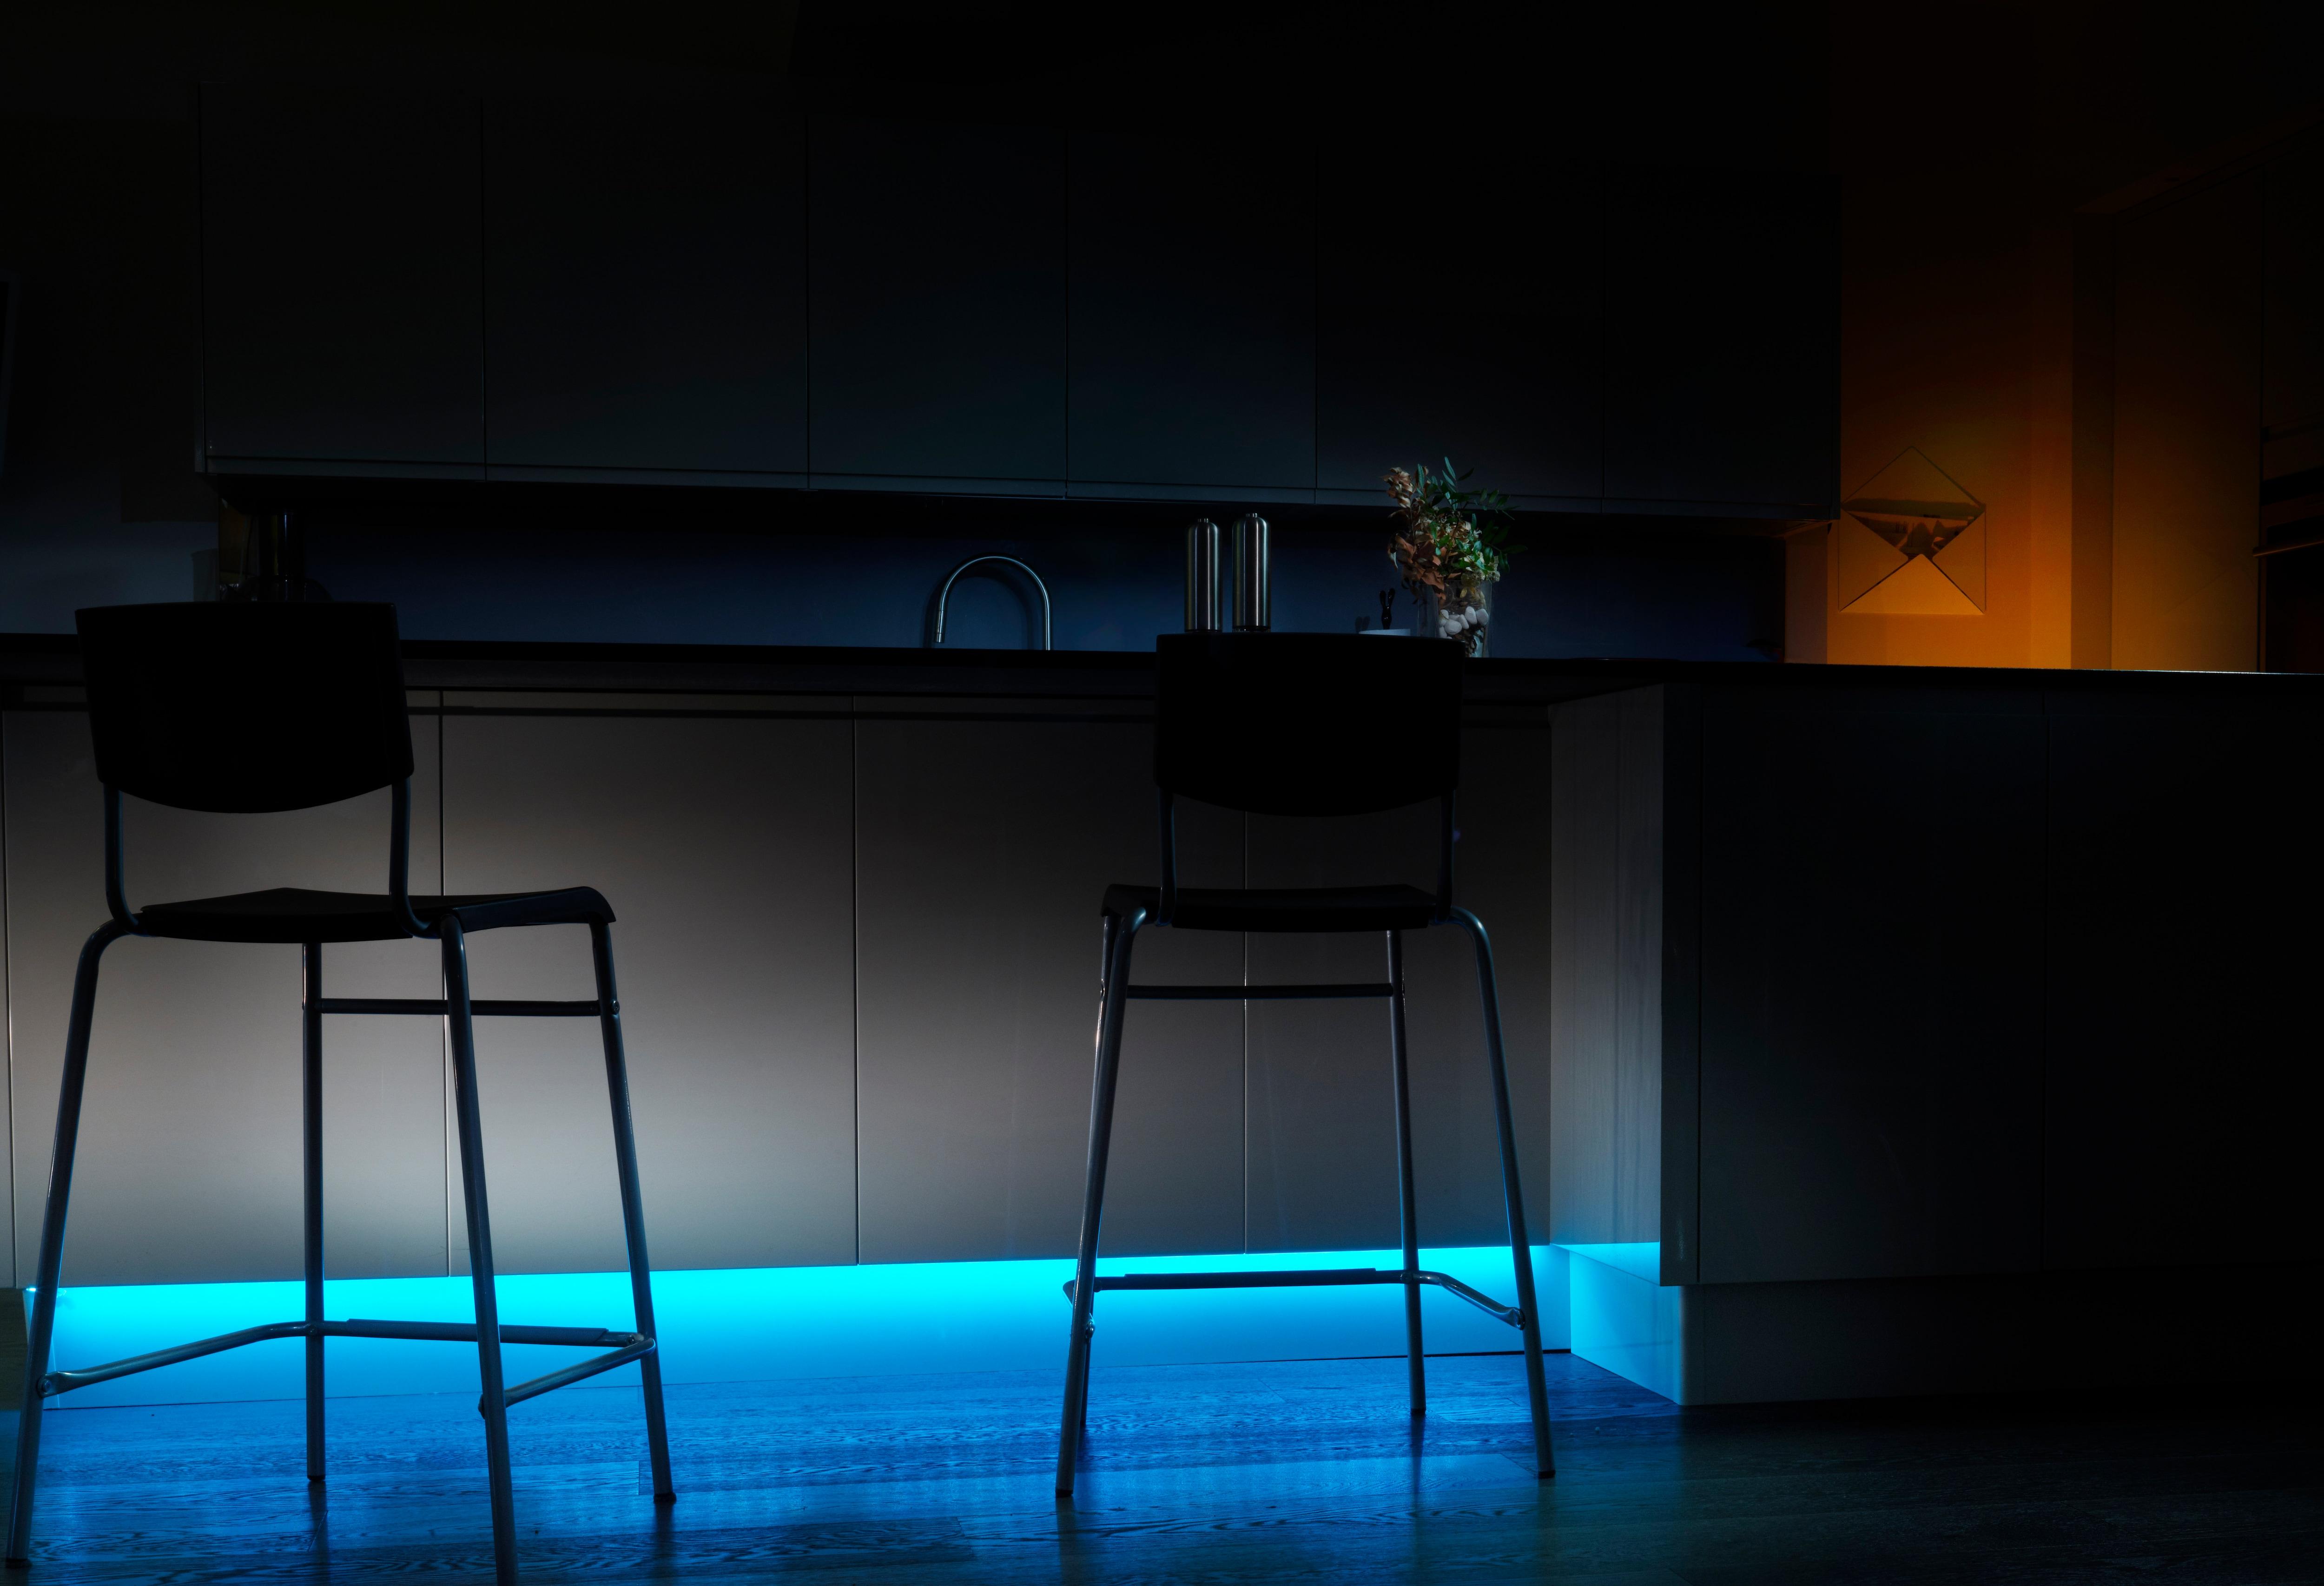 friends of hue philips erweitert die palette smartphone gesteuerter wohnraumbeleuchtung. Black Bedroom Furniture Sets. Home Design Ideas